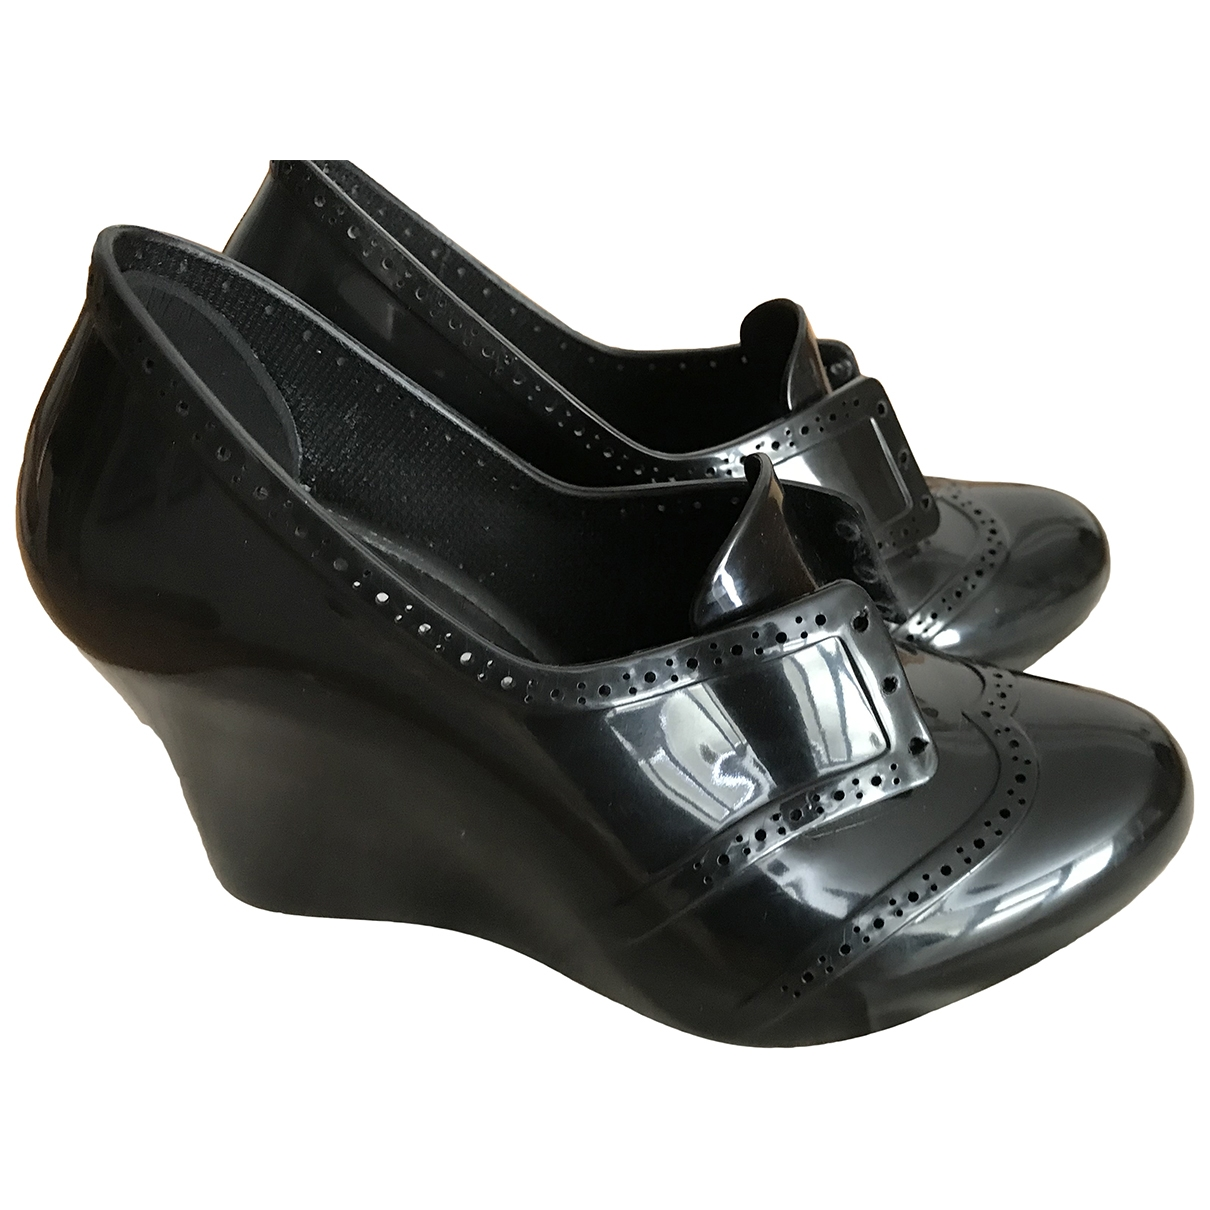 Melissa \N Black Patent leather Heels for Women 38 EU